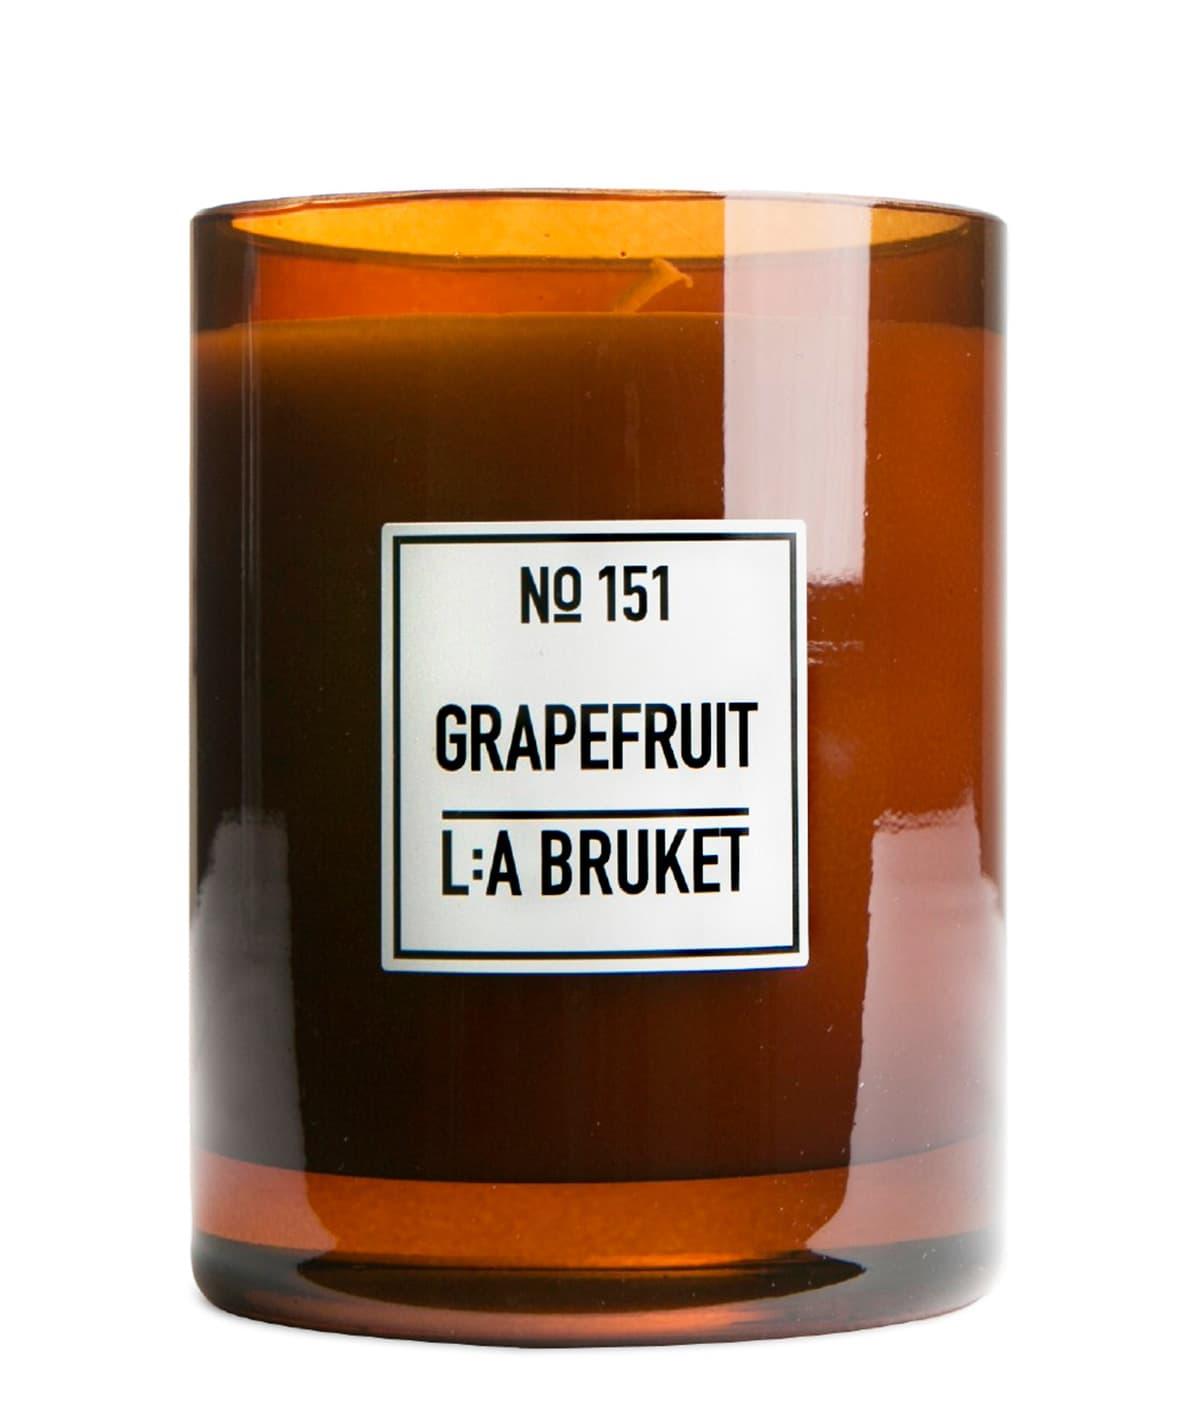 L:A Bruket Grapefruit Scented Candle